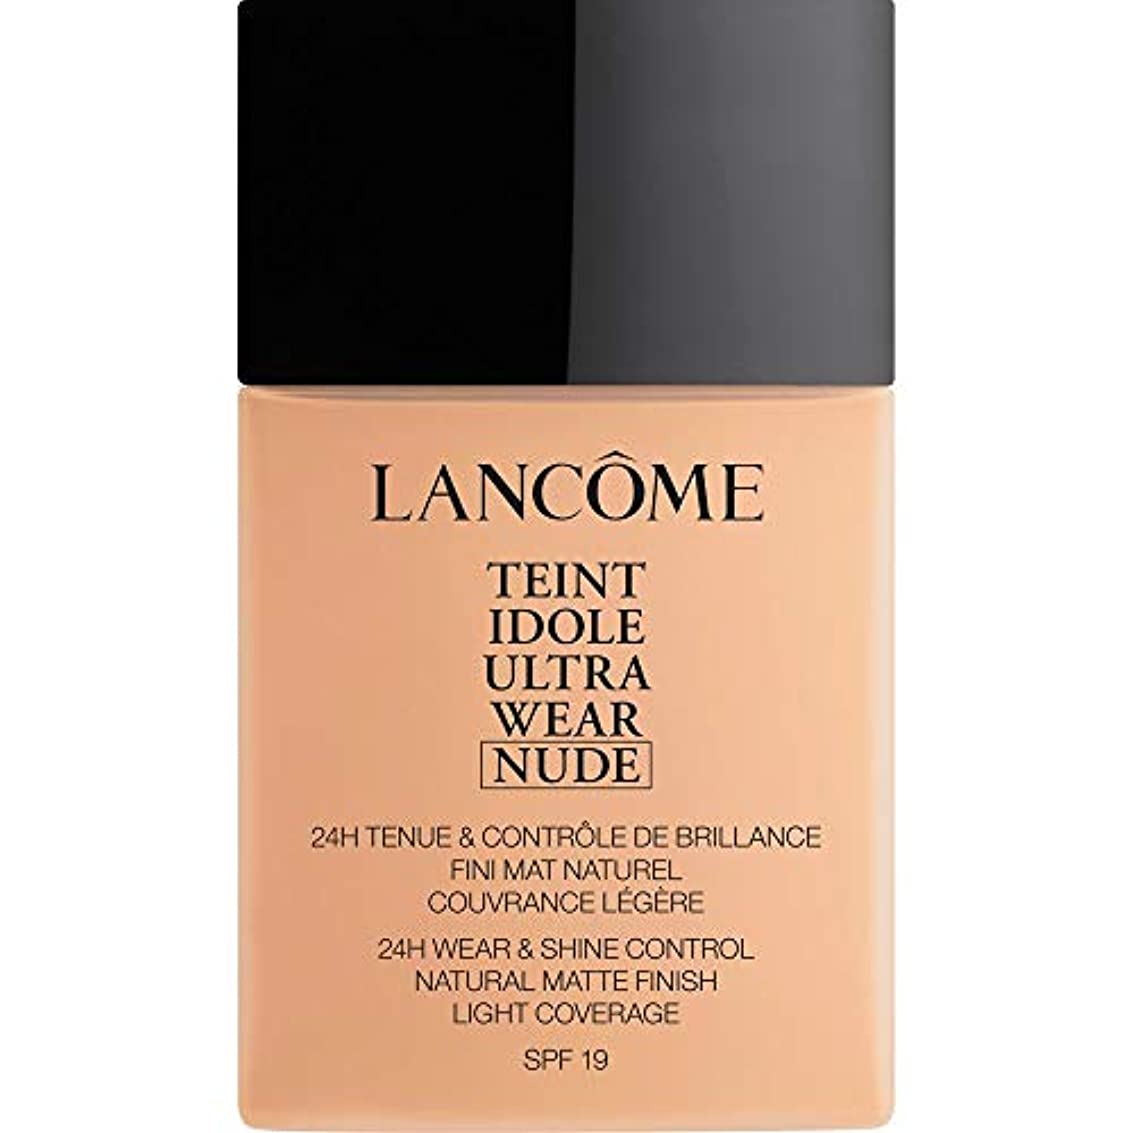 [Lanc?me ] ランコムTeintのIdole超摩耗ヌード財団Spf19の40ミリリットル023 - ベージュオロール - Lancome Teint Idole Ultra Wear Nude Foundation...